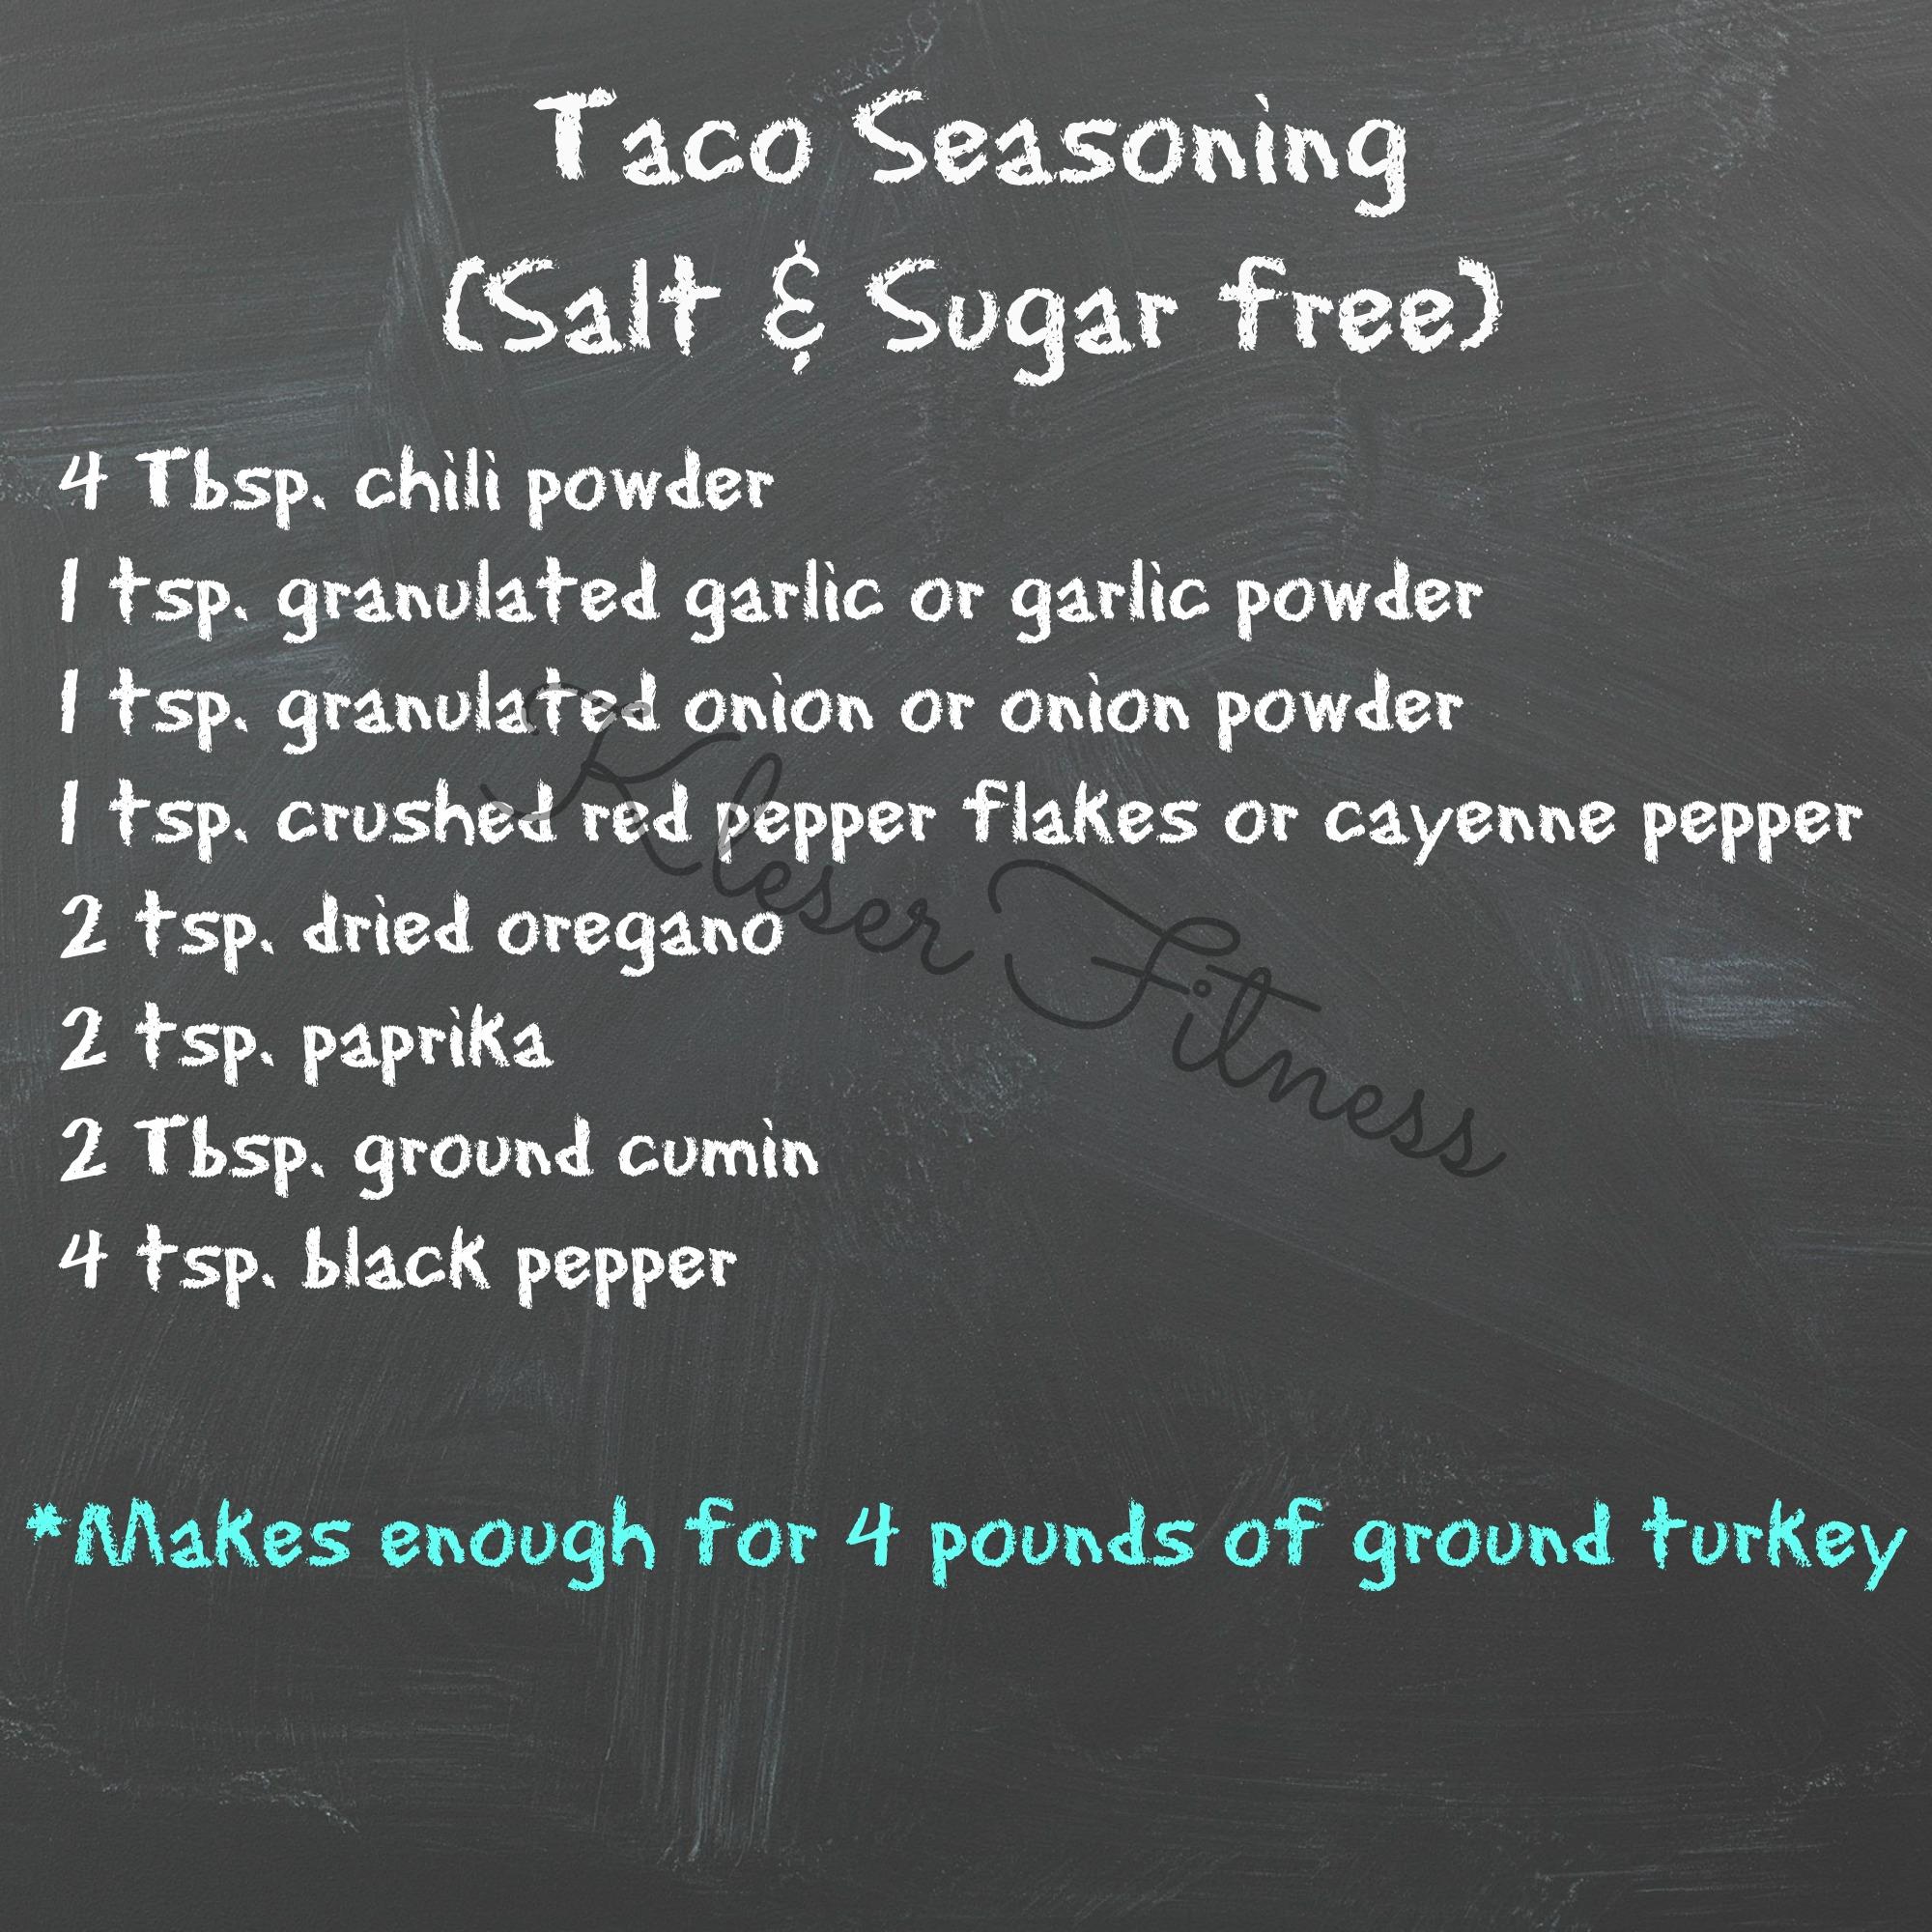 Taco Seasoning.jpg